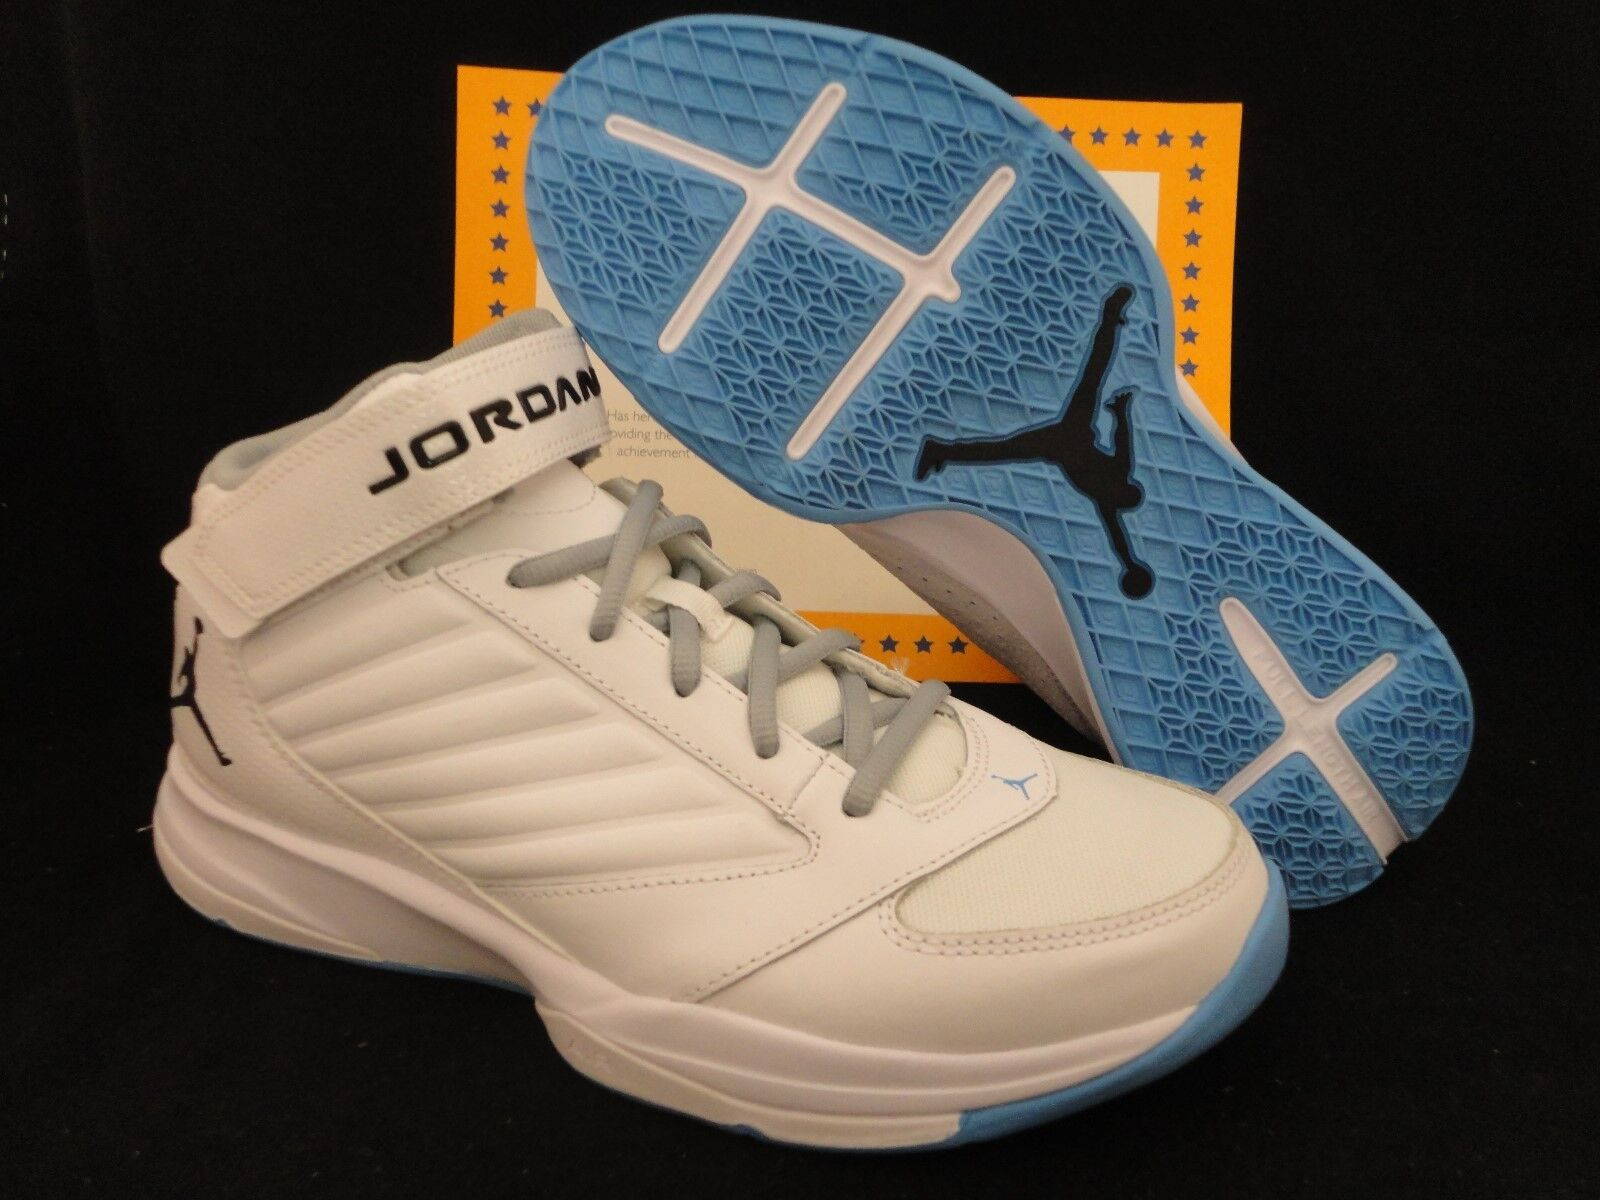 on sale d6b9f c6534 ... Size Nike Jordan BCT Mid 3, UNC, White White White   Baby Blue, ...